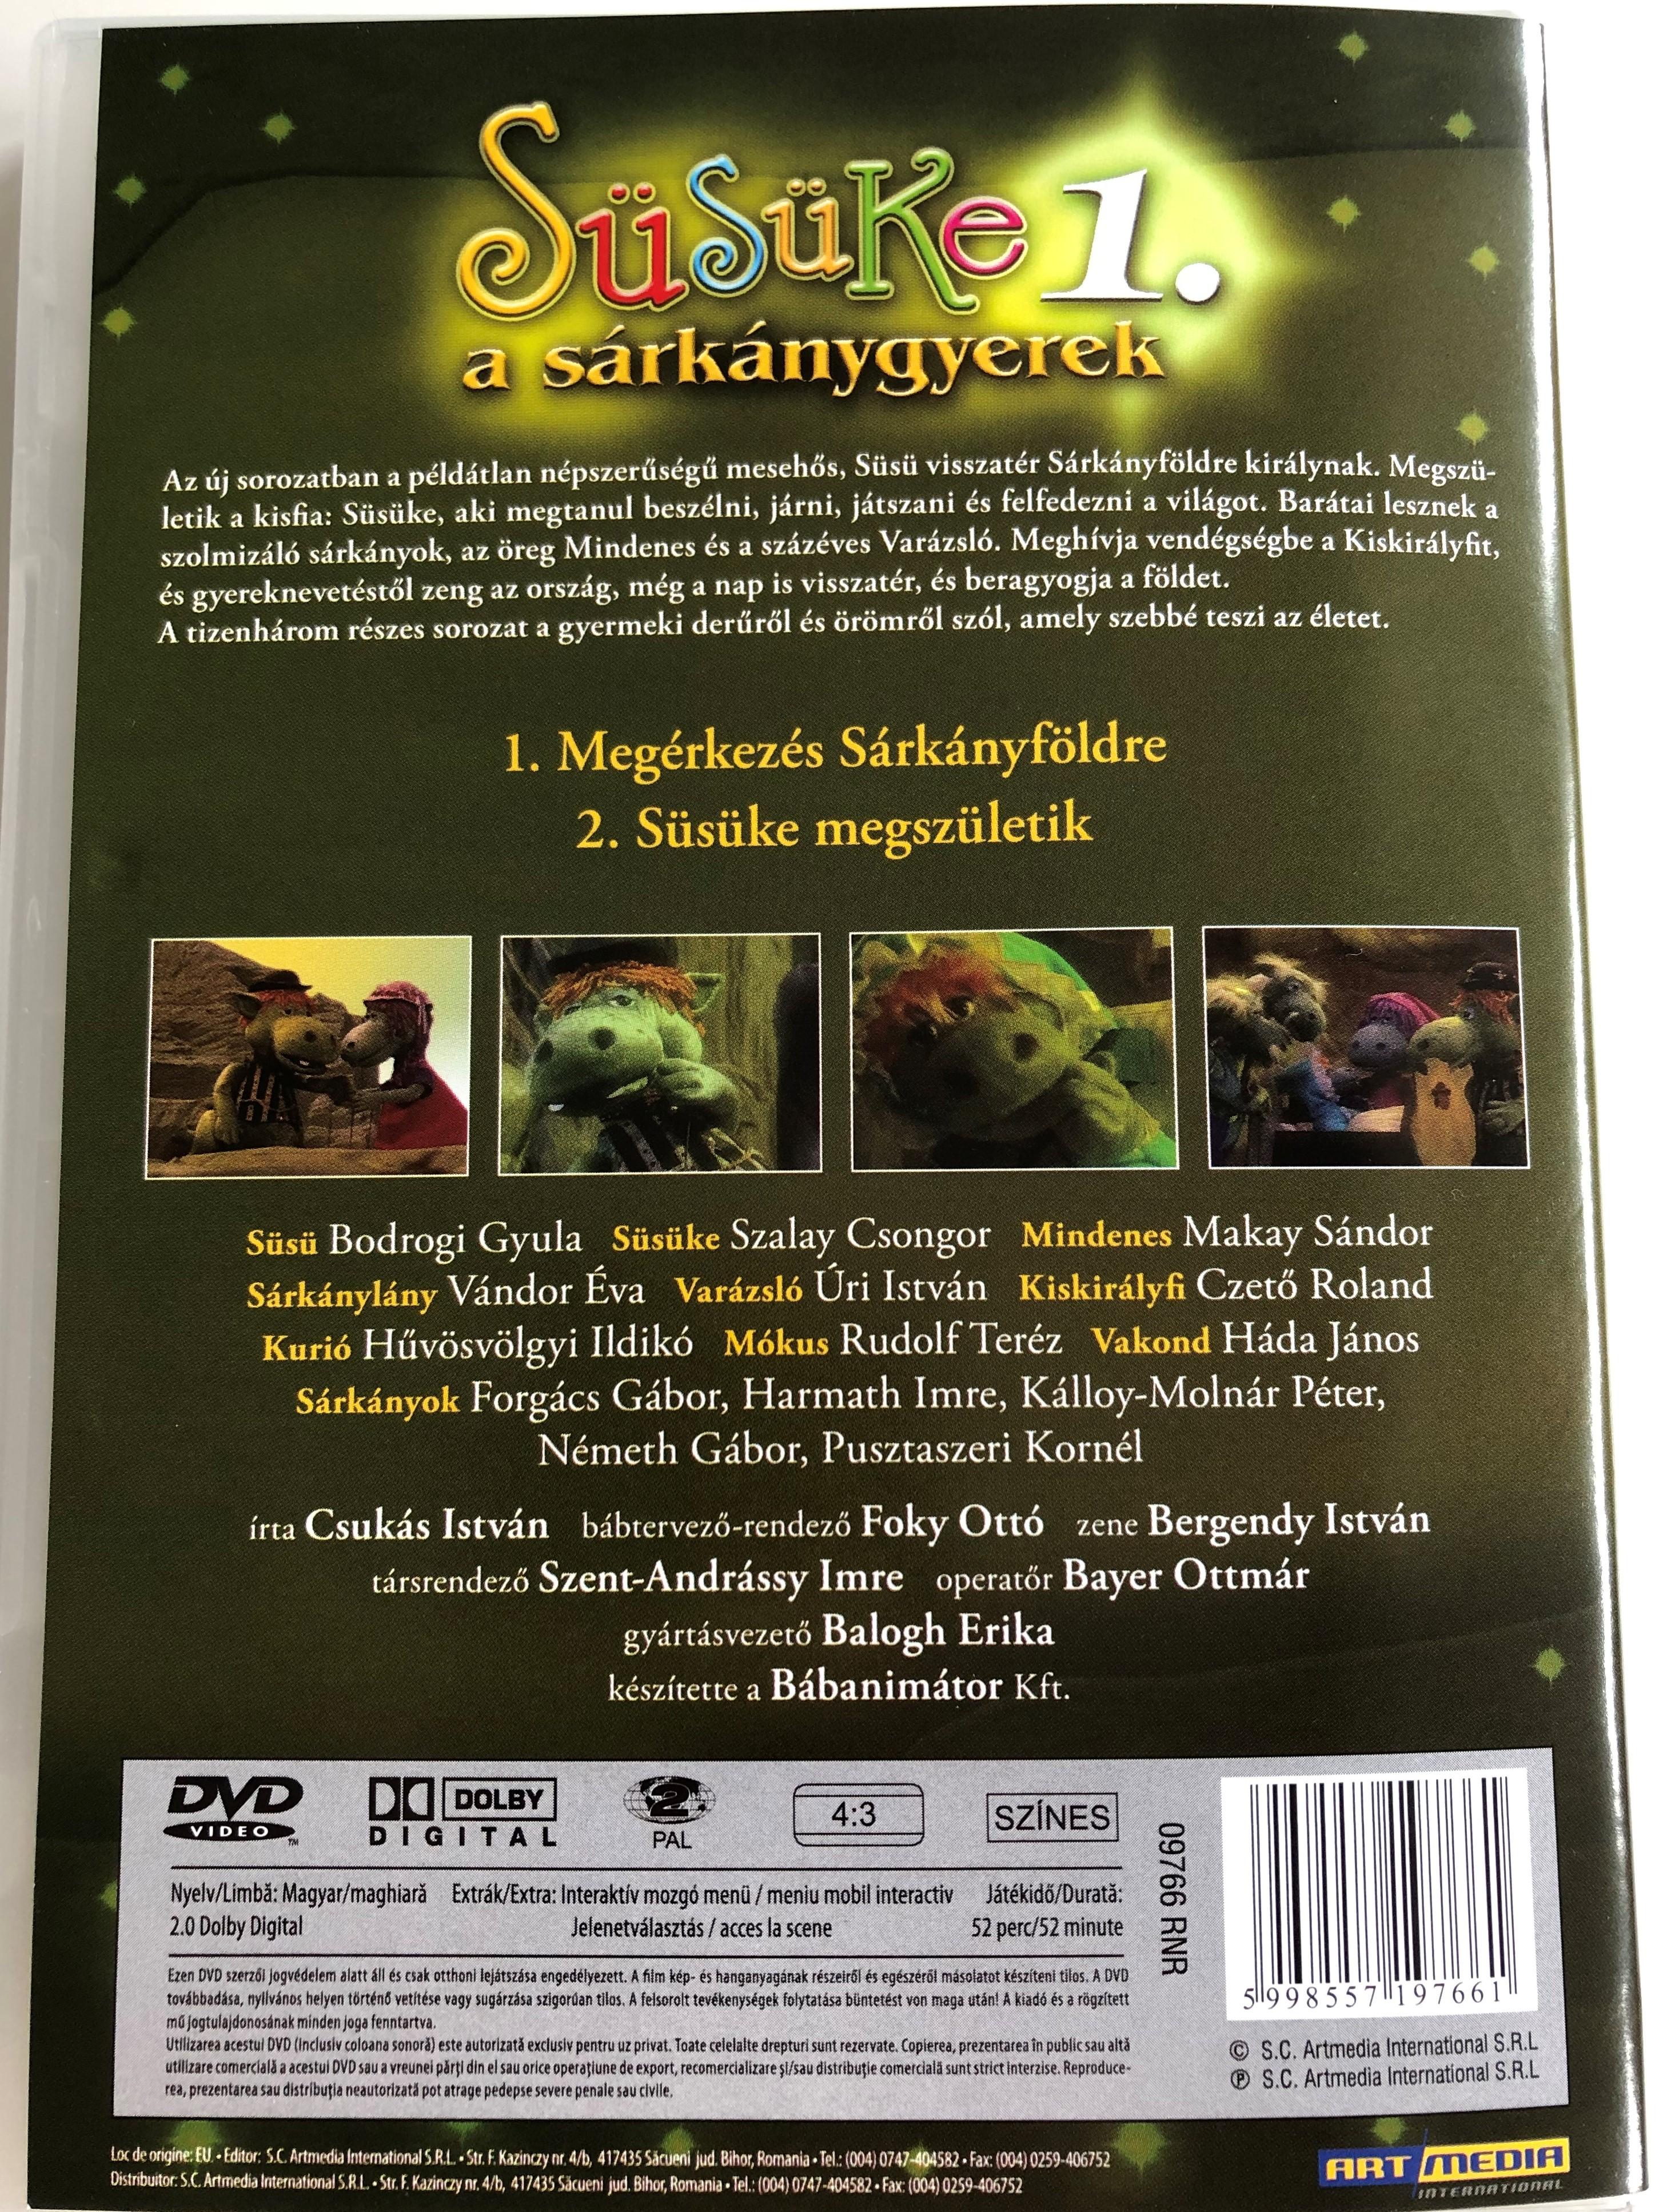 s-s-ke-a-s-rk-nygyerek-1.-dvd-2001-s-s-ke-megsz-letik-2.jpg